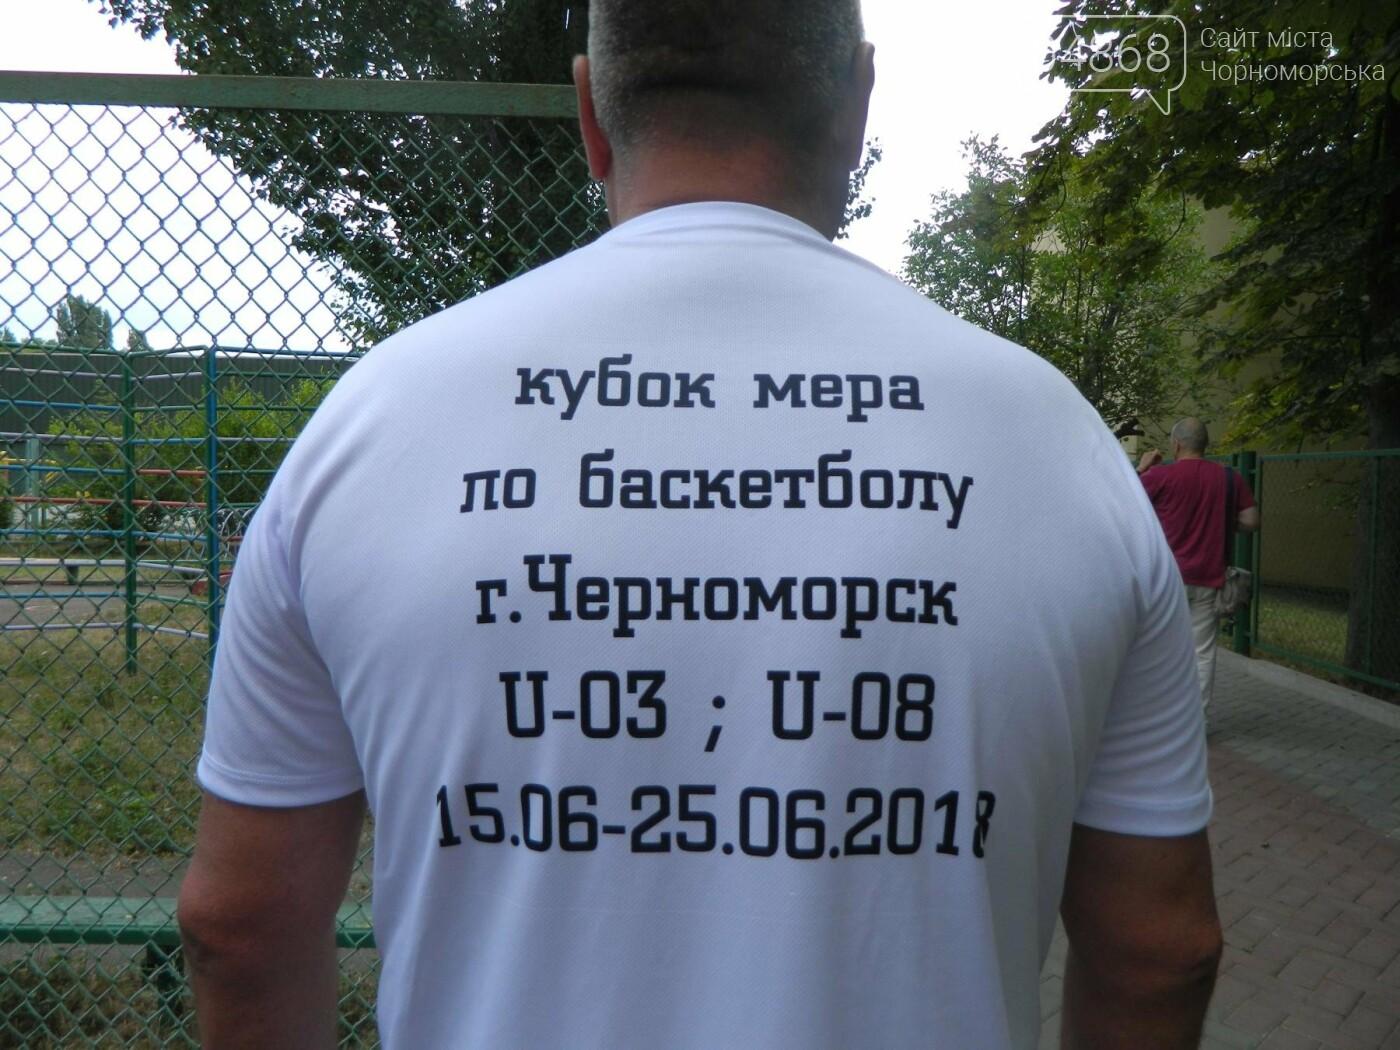 Баскетболу в Черноморске - «В добрый час!», фото-2